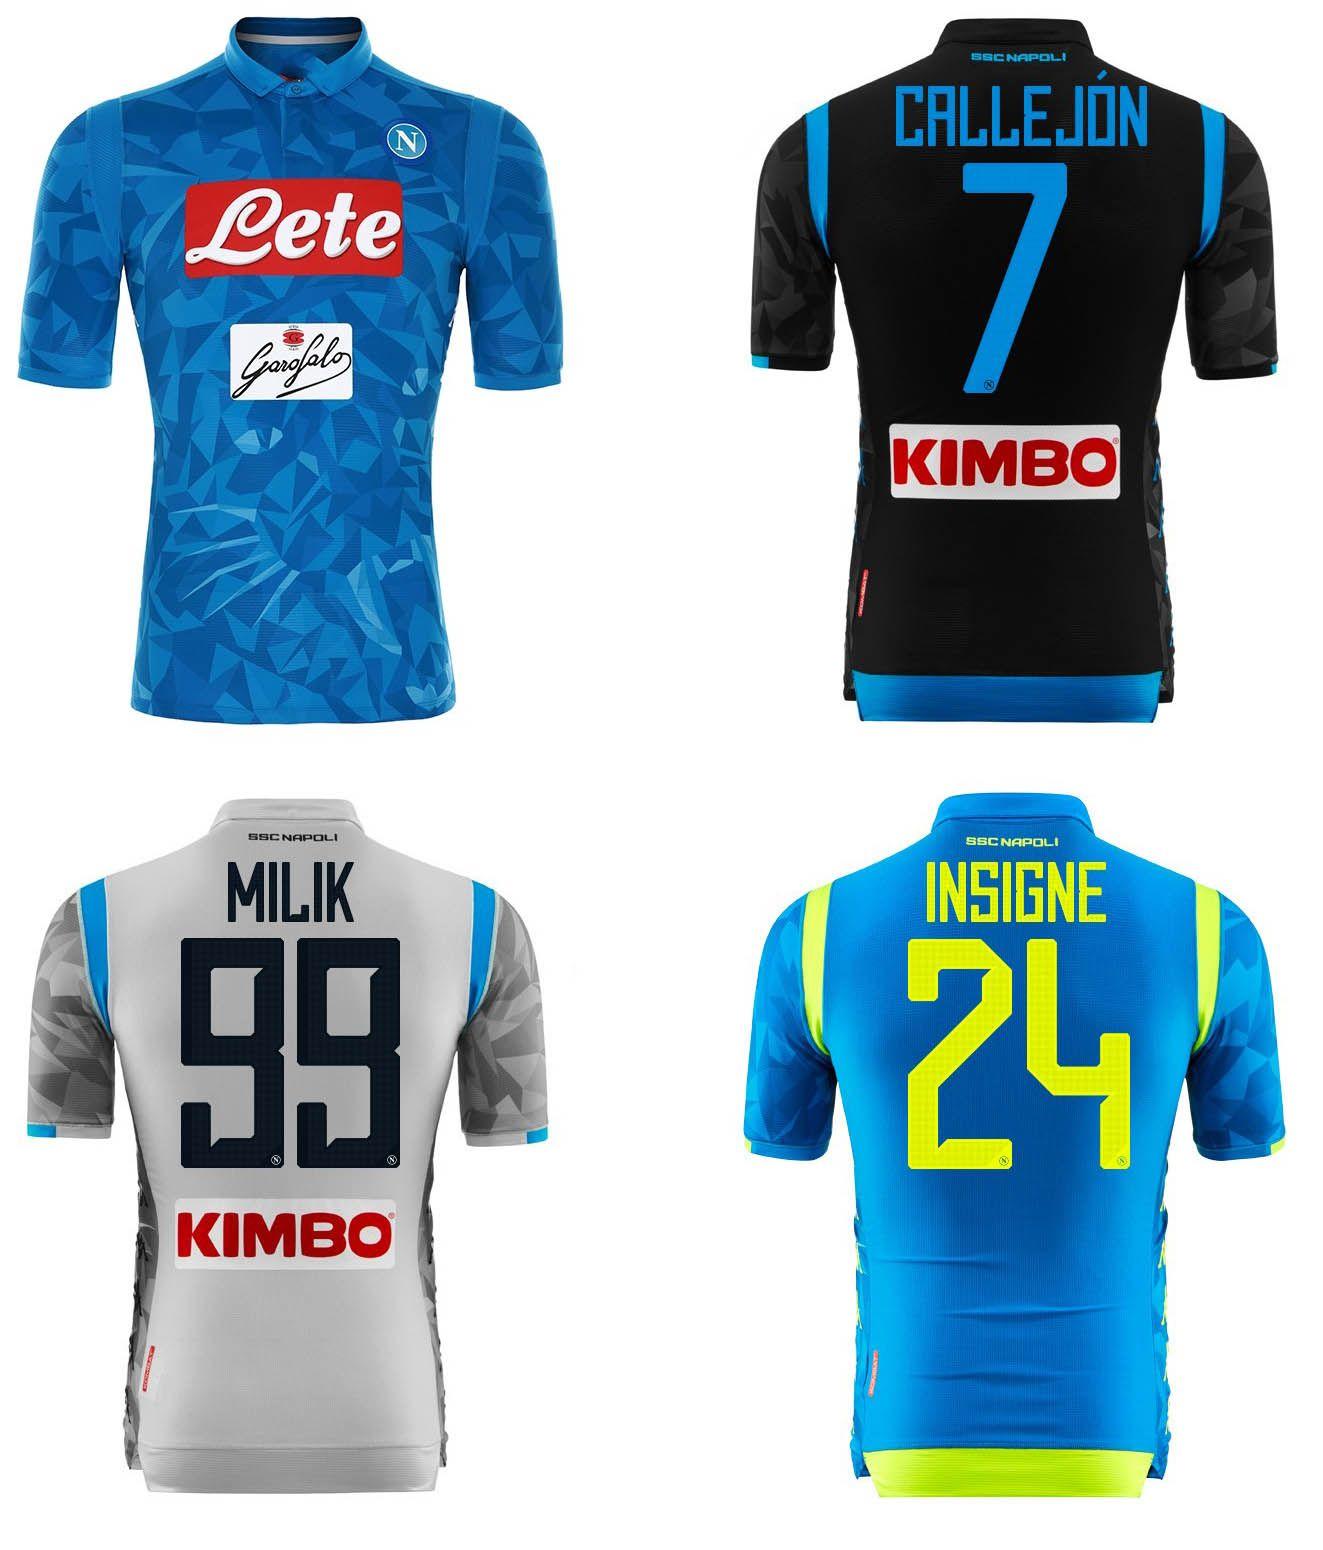 2018 2019 Napoli Camisetas De Fútbol Nápoles Inicio Fútbol Azul Camisetas  18 19 HAMSIK L.INSIGNE PLAYER MERTENS Camisetas De Fútbol Uniformes  Deportivos Por ... d9f8d7f005a32